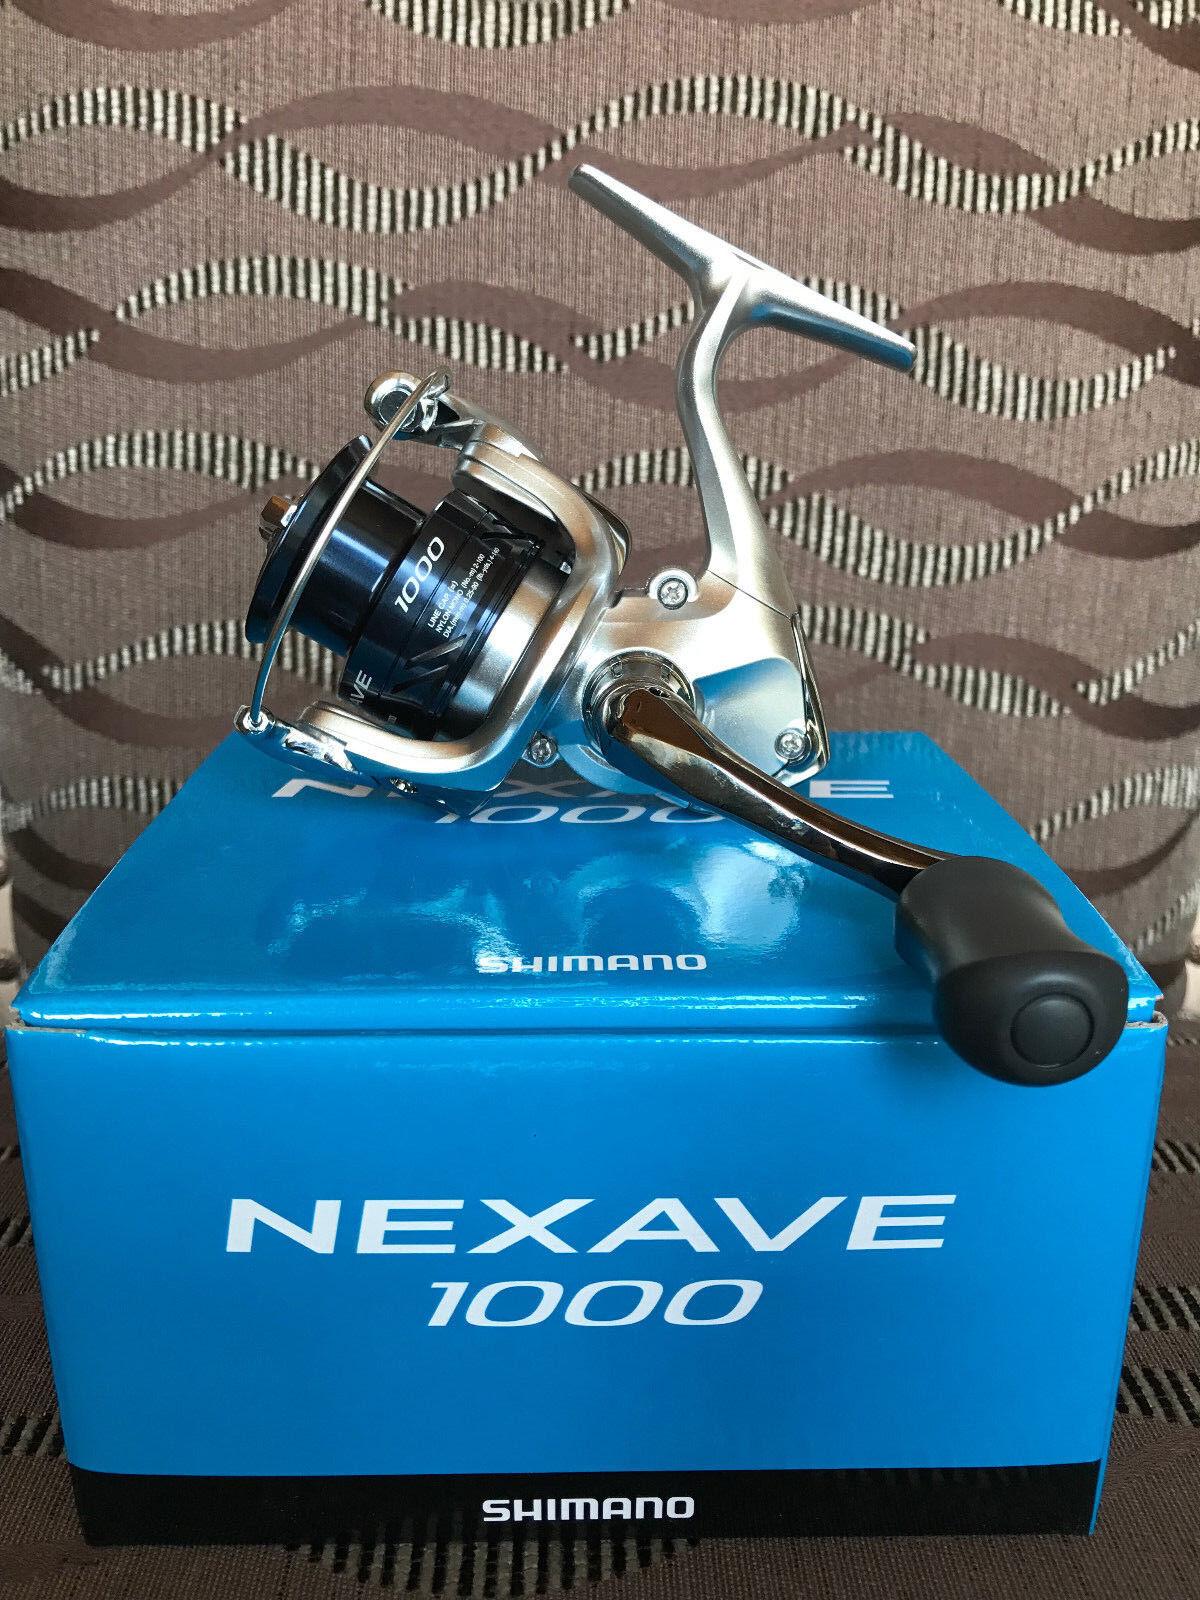 Shimano Nexave 1000 FE spinnrolle spinnrolle spinnrolle 2c9670